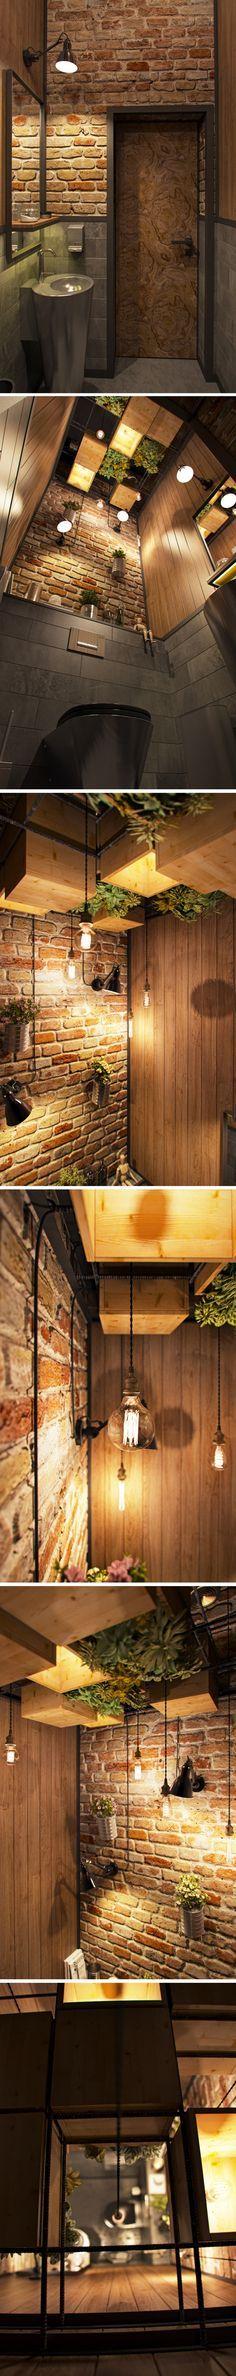 toilet   loft - Галерея 3ddd.ru